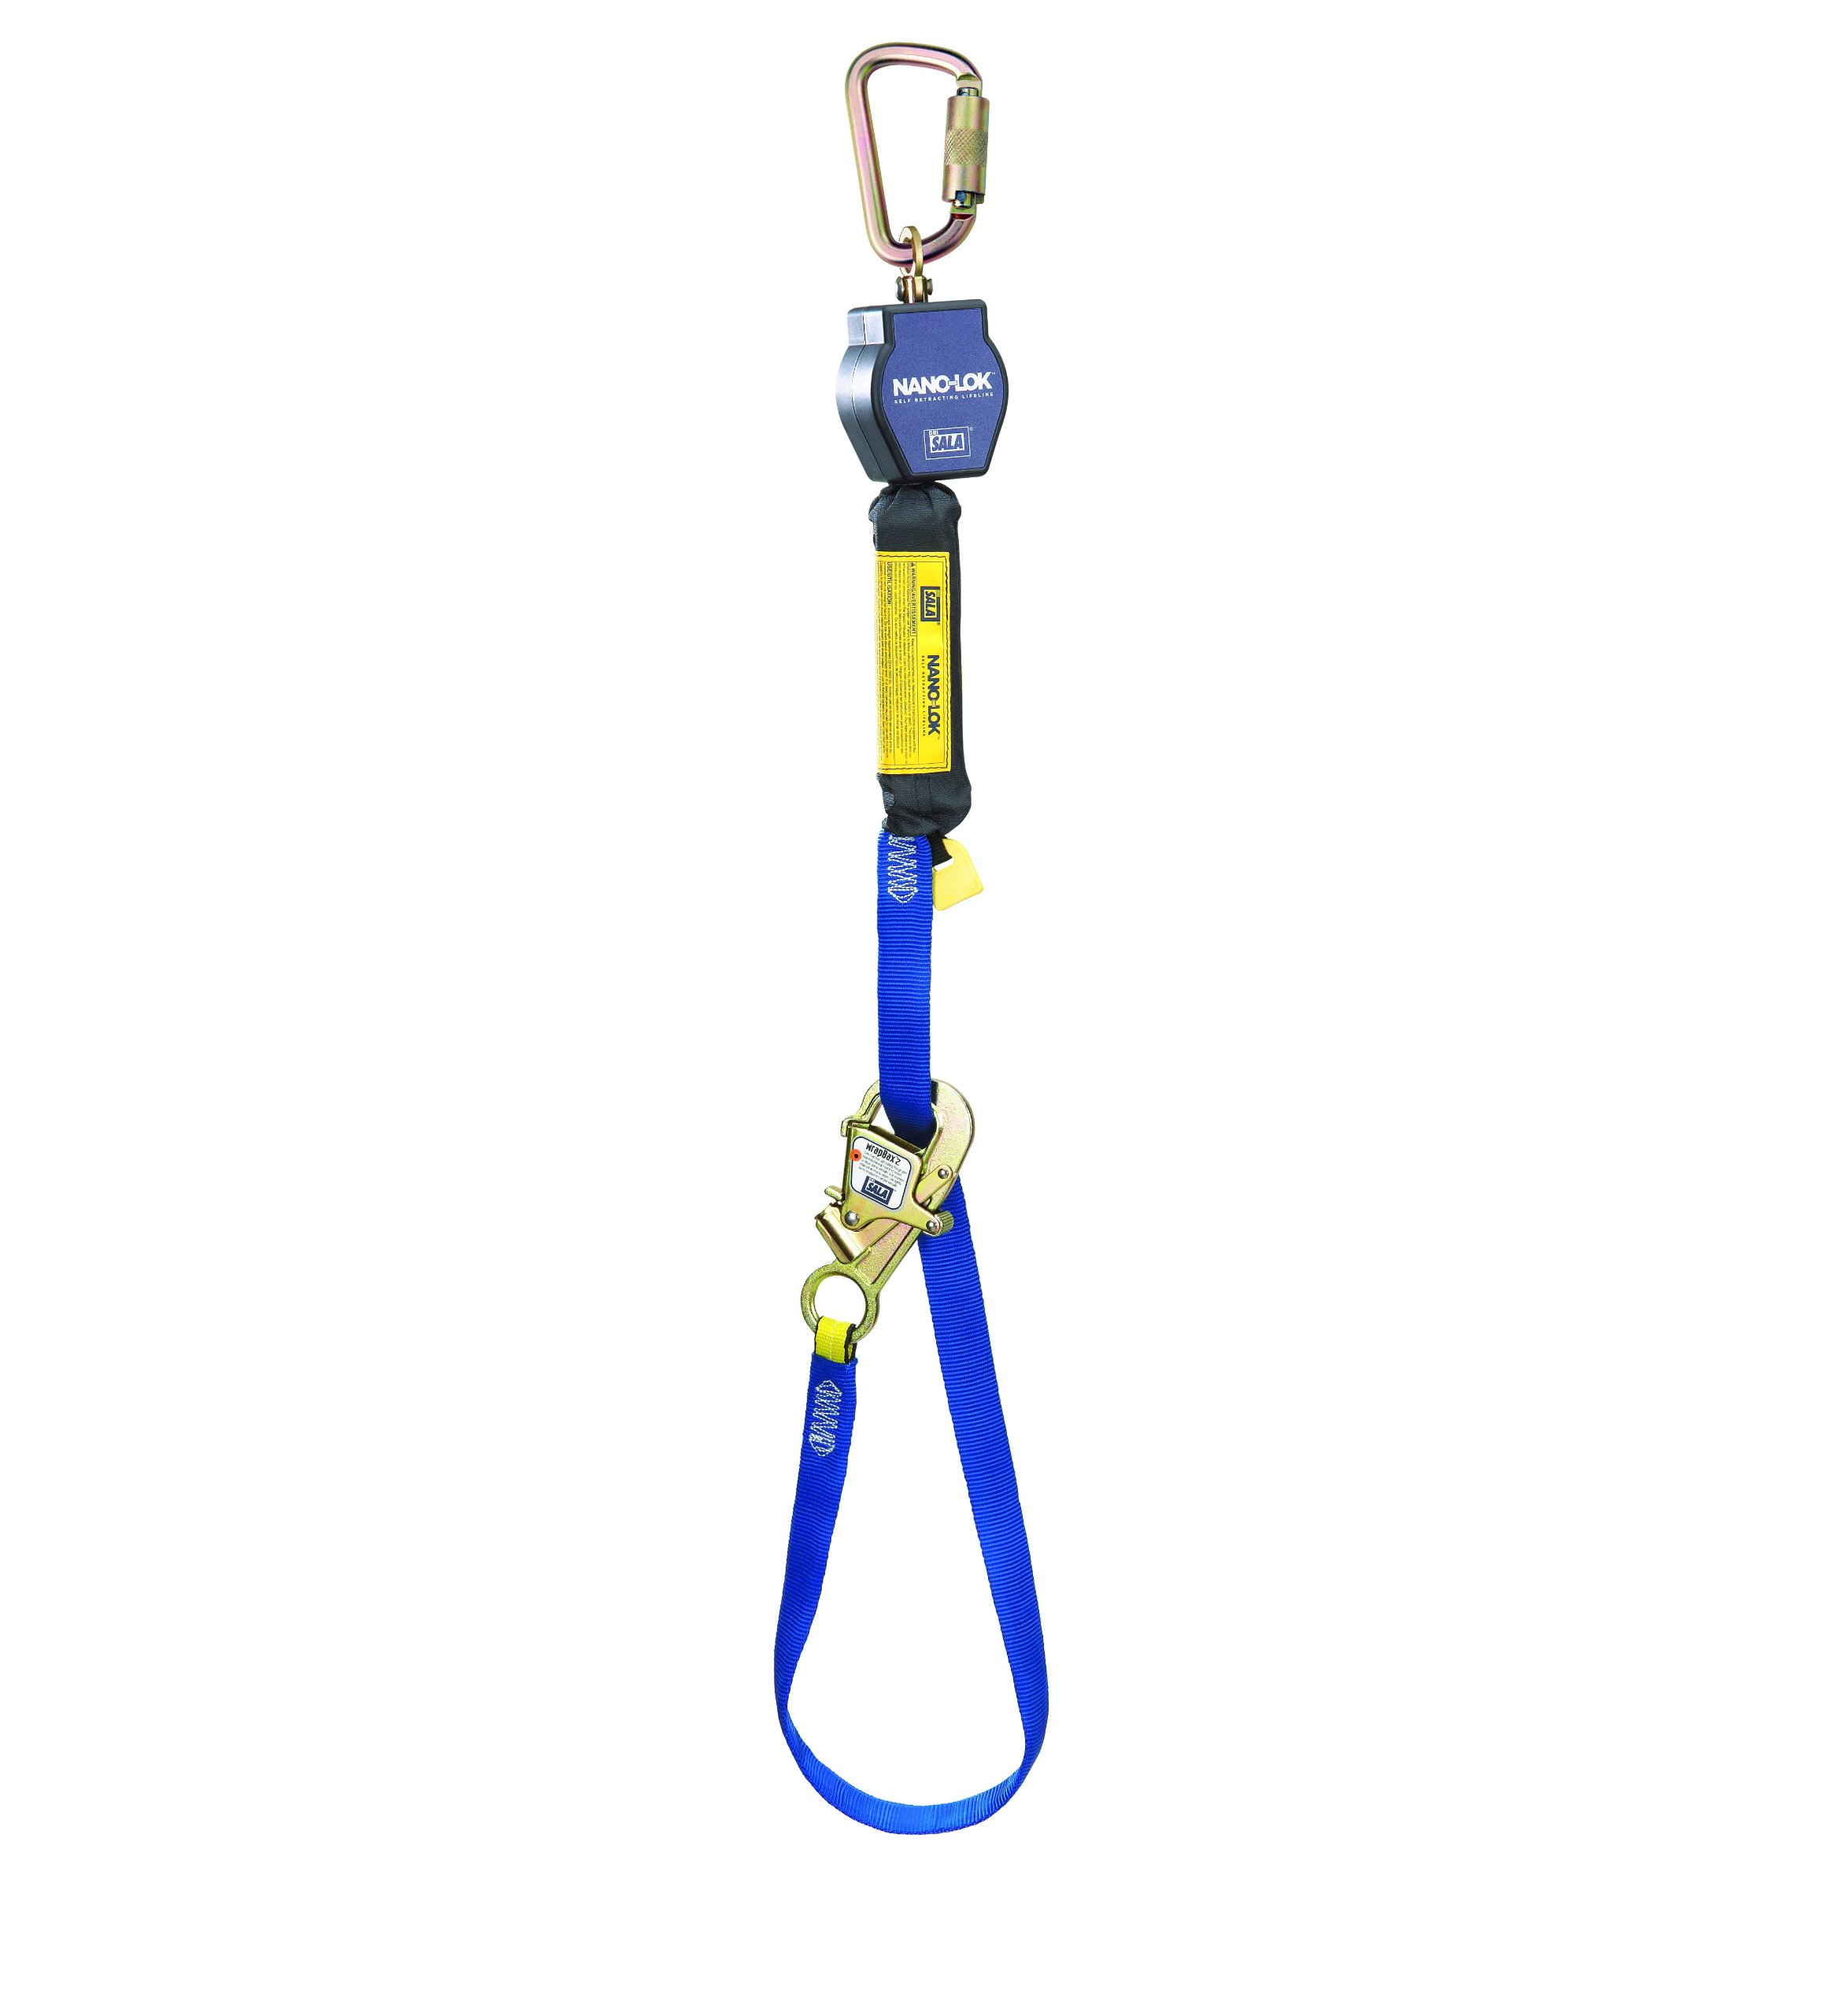 3M DBI-SALA Nano-Lok 3101367 Tie Back Self Retracting Lifeline, 9', 3/4'' Dynema Polyester Web, Tie-Back Hook, Swiveling Anchor Loop with Steel Carabiner, Blue by 3M Personal Protective Equipment